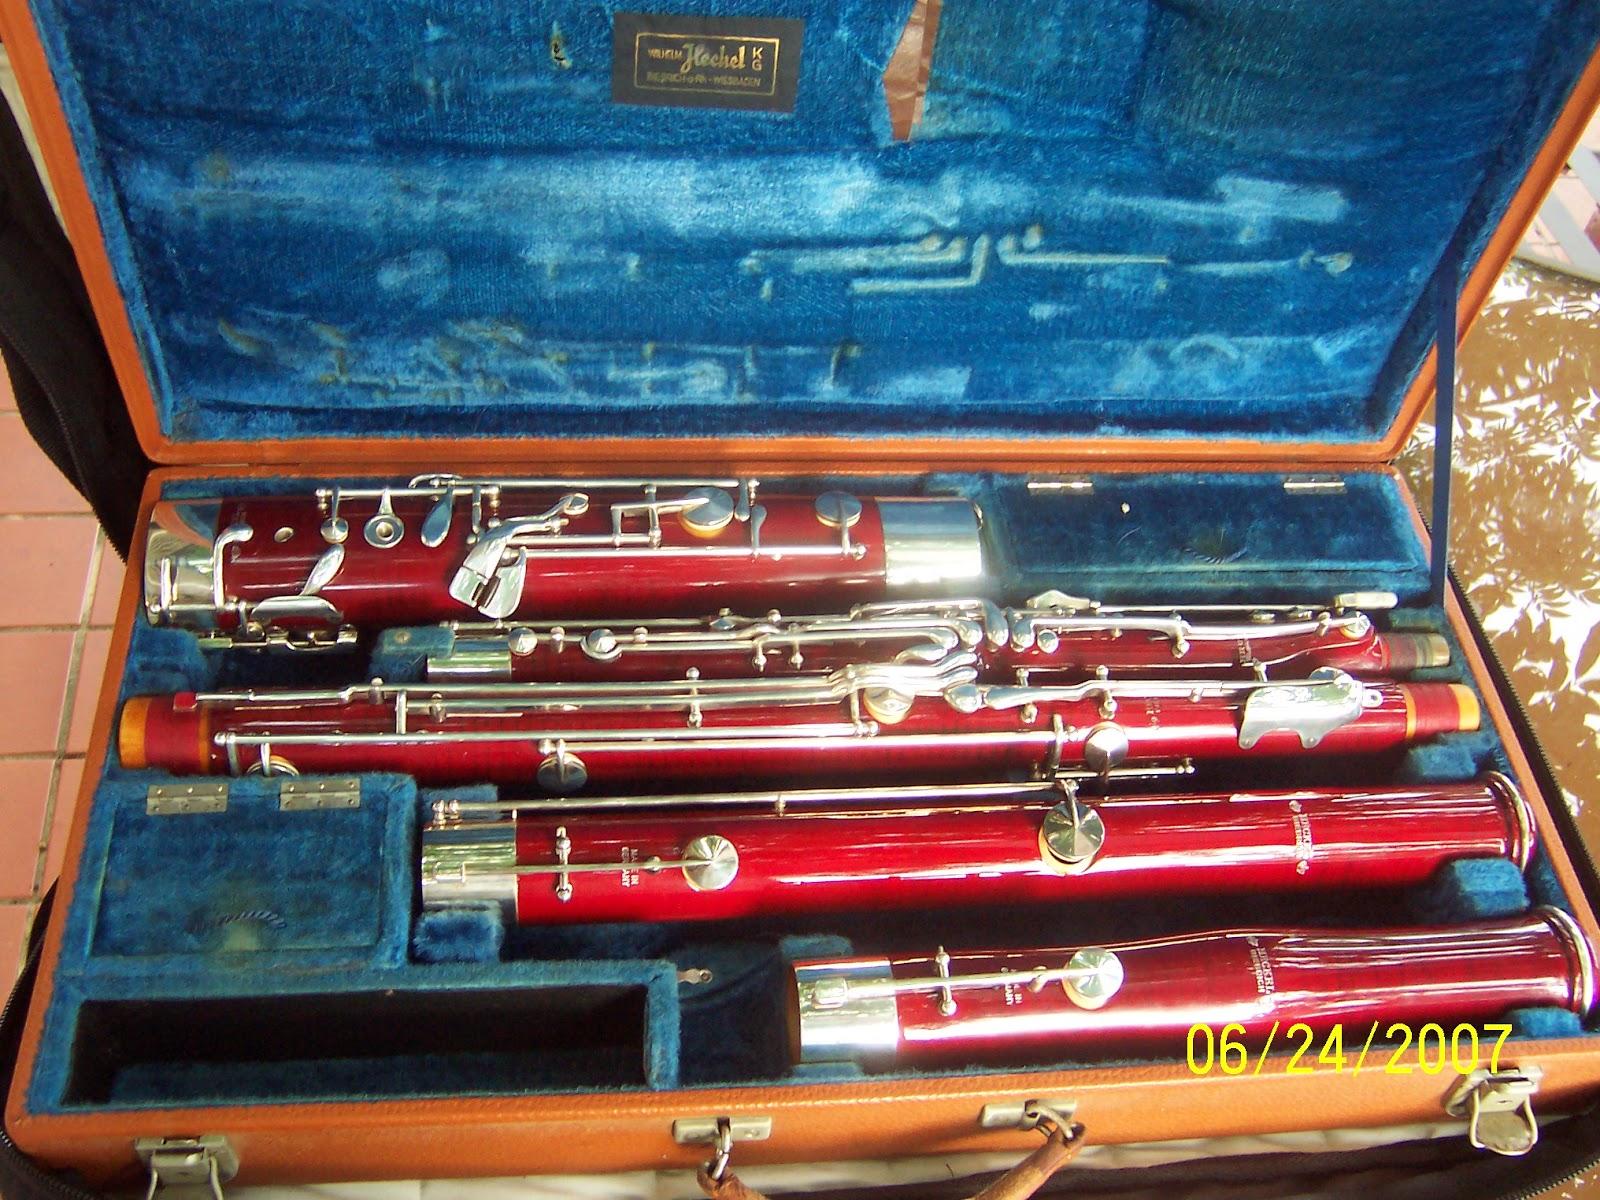 http://www.heckelbassoons.info/images/bassoons/12262/incase.jpg